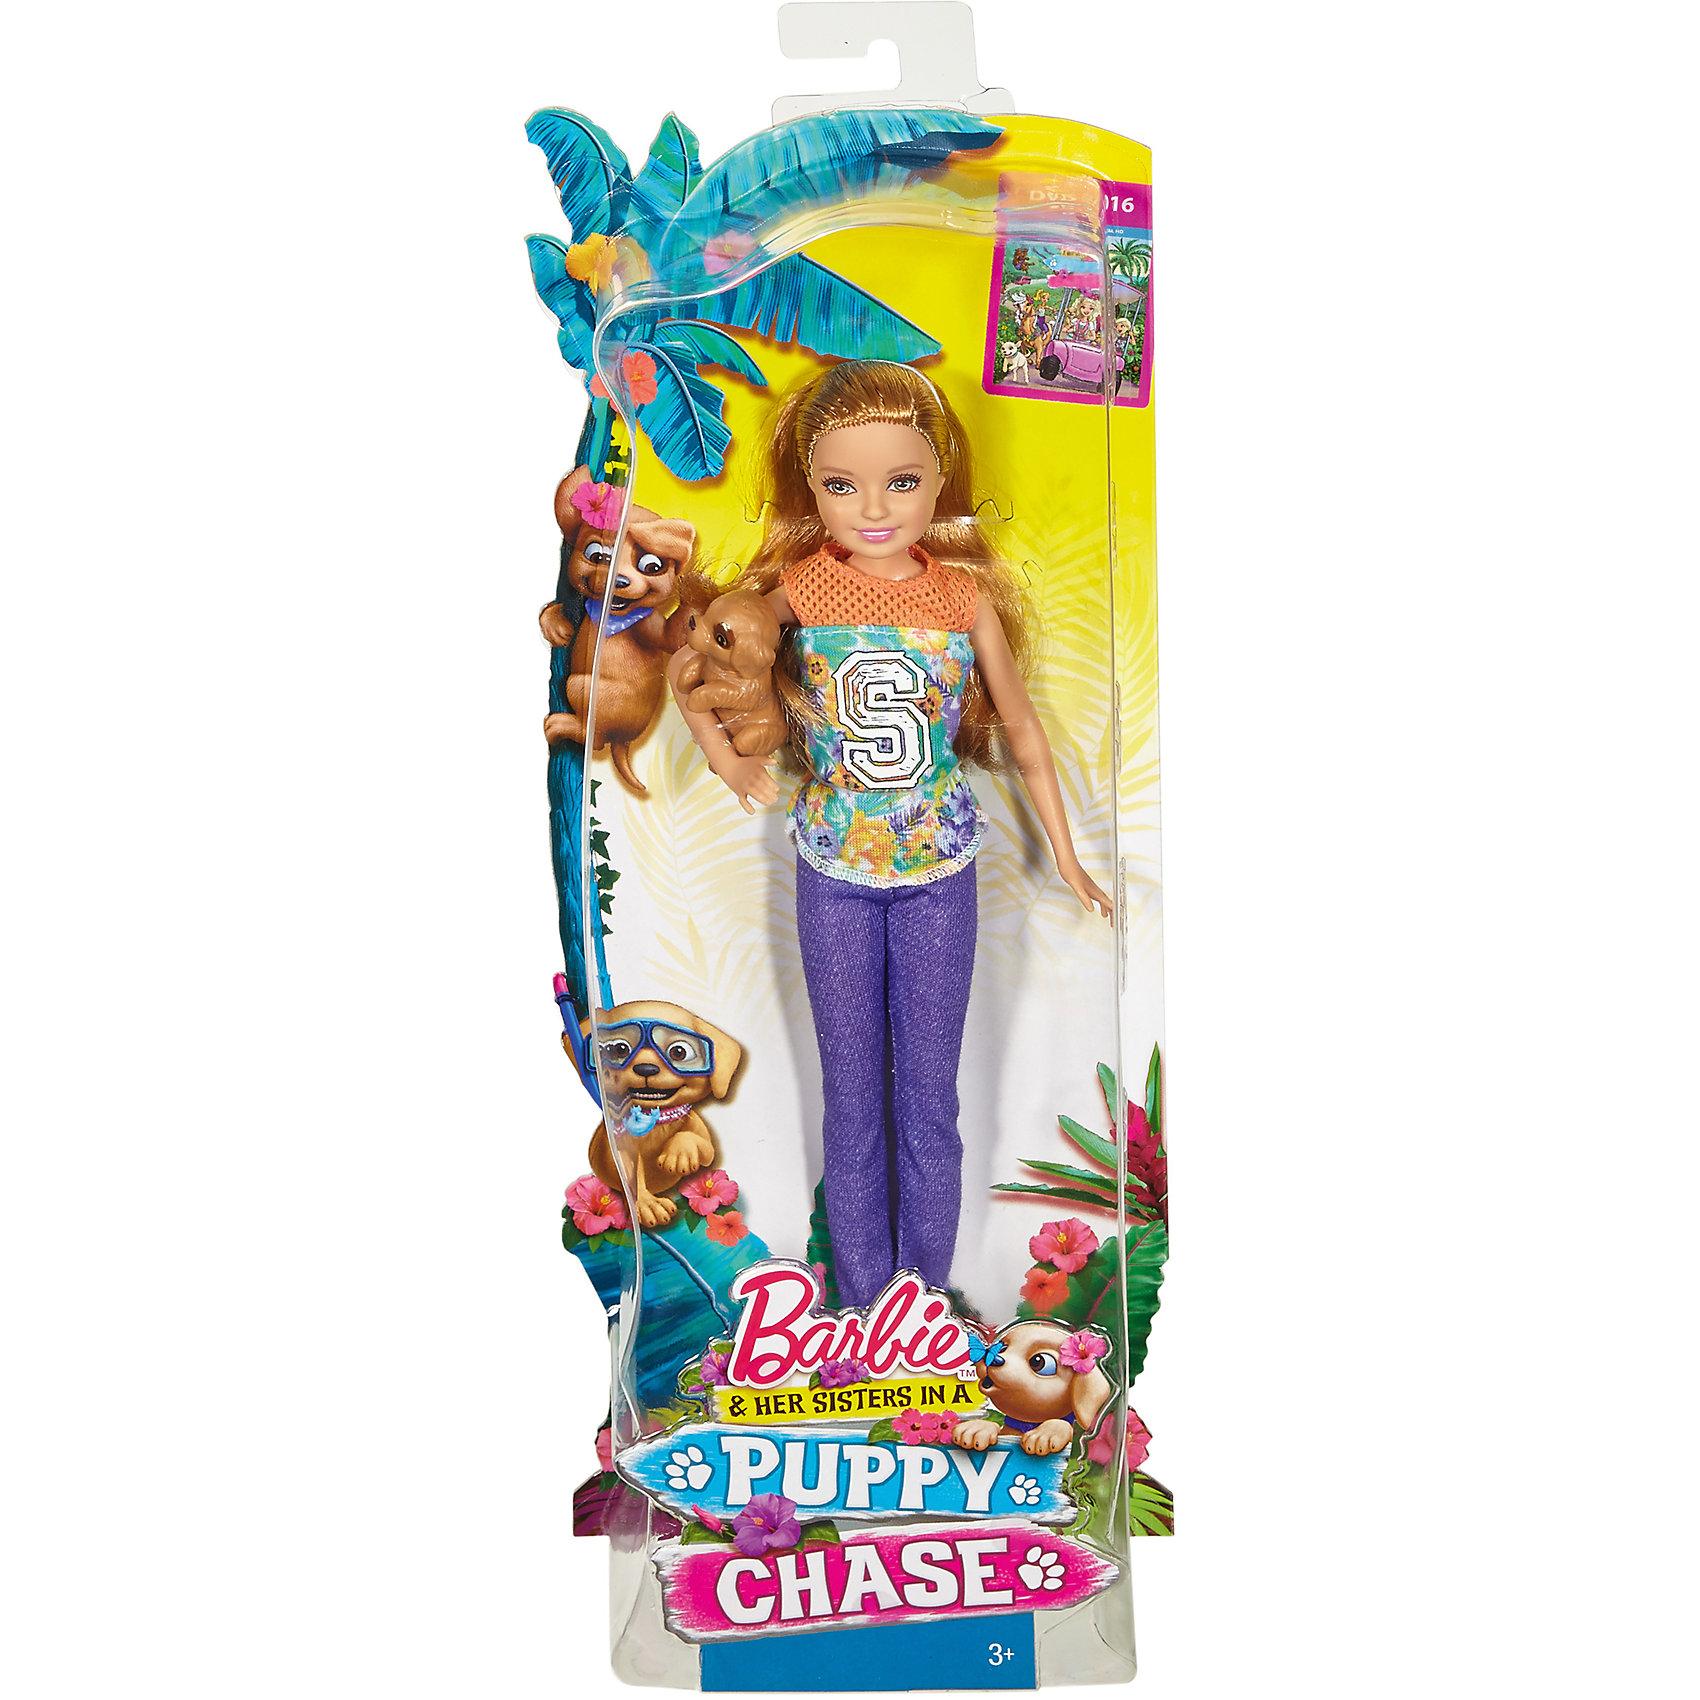 Кукла-сестра Barbie со щенками, Barbie<br><br>Ширина мм: 328<br>Глубина мм: 129<br>Высота мм: 53<br>Вес г: 189<br>Возраст от месяцев: 36<br>Возраст до месяцев: 72<br>Пол: Женский<br>Возраст: Детский<br>SKU: 5440247